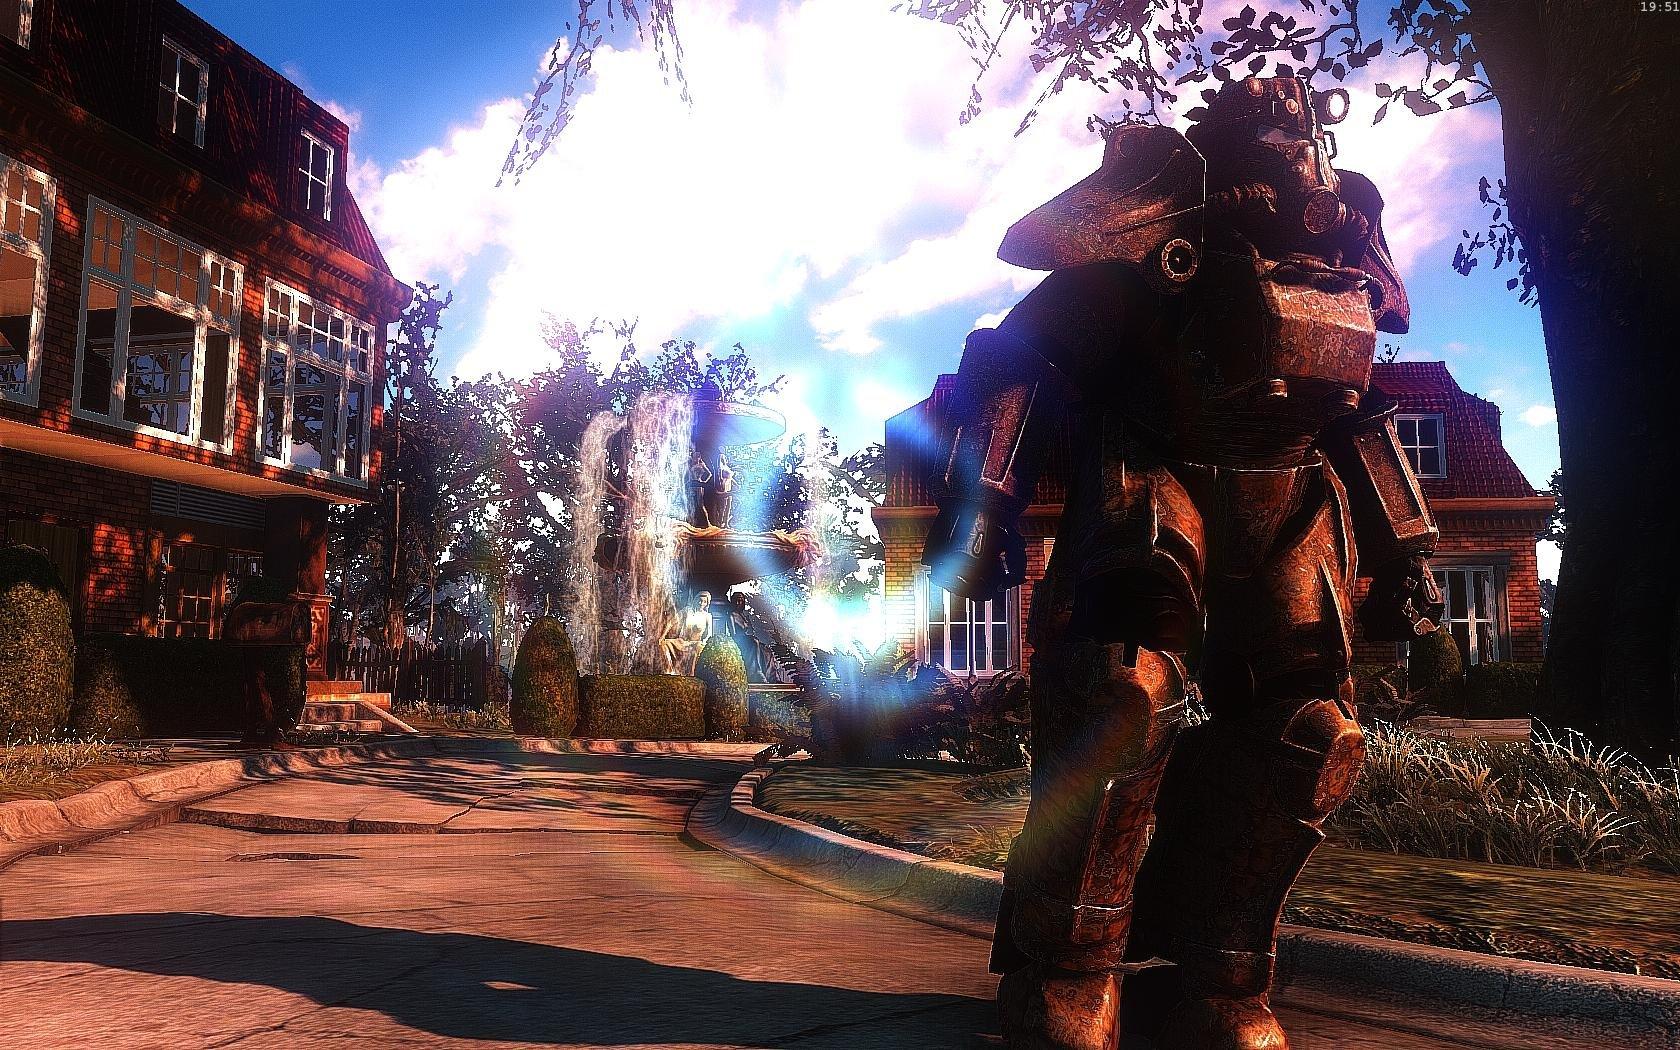 Fallout4 2019-01-17 19-51-32-87